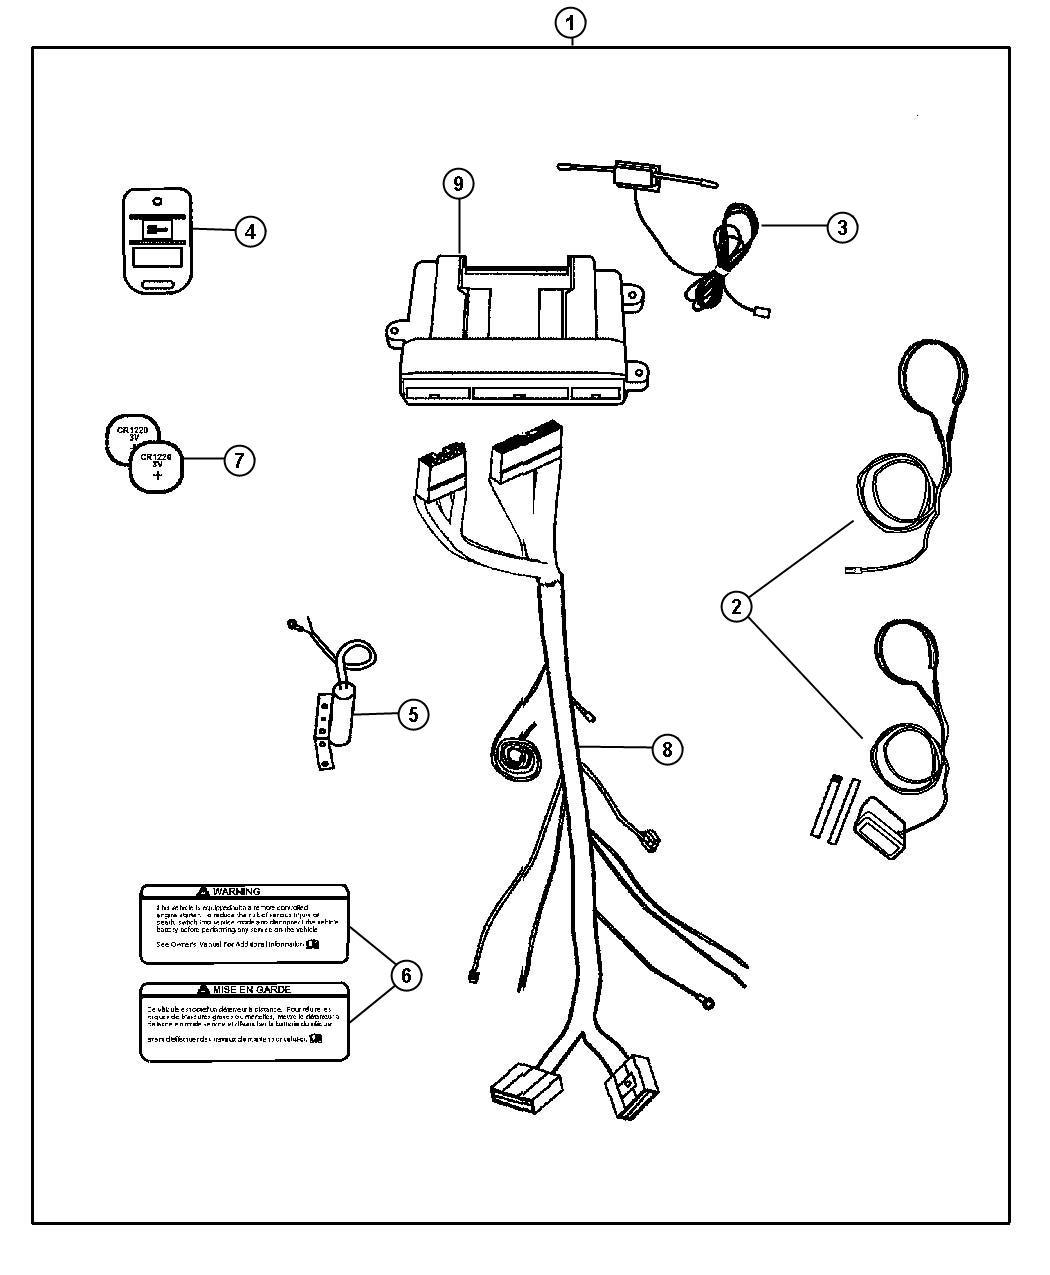 Chrysler 300m Remote Start Wiring Diagram Source Caravan Alarm Mazda 3 In Addition Dodge Grand Viper